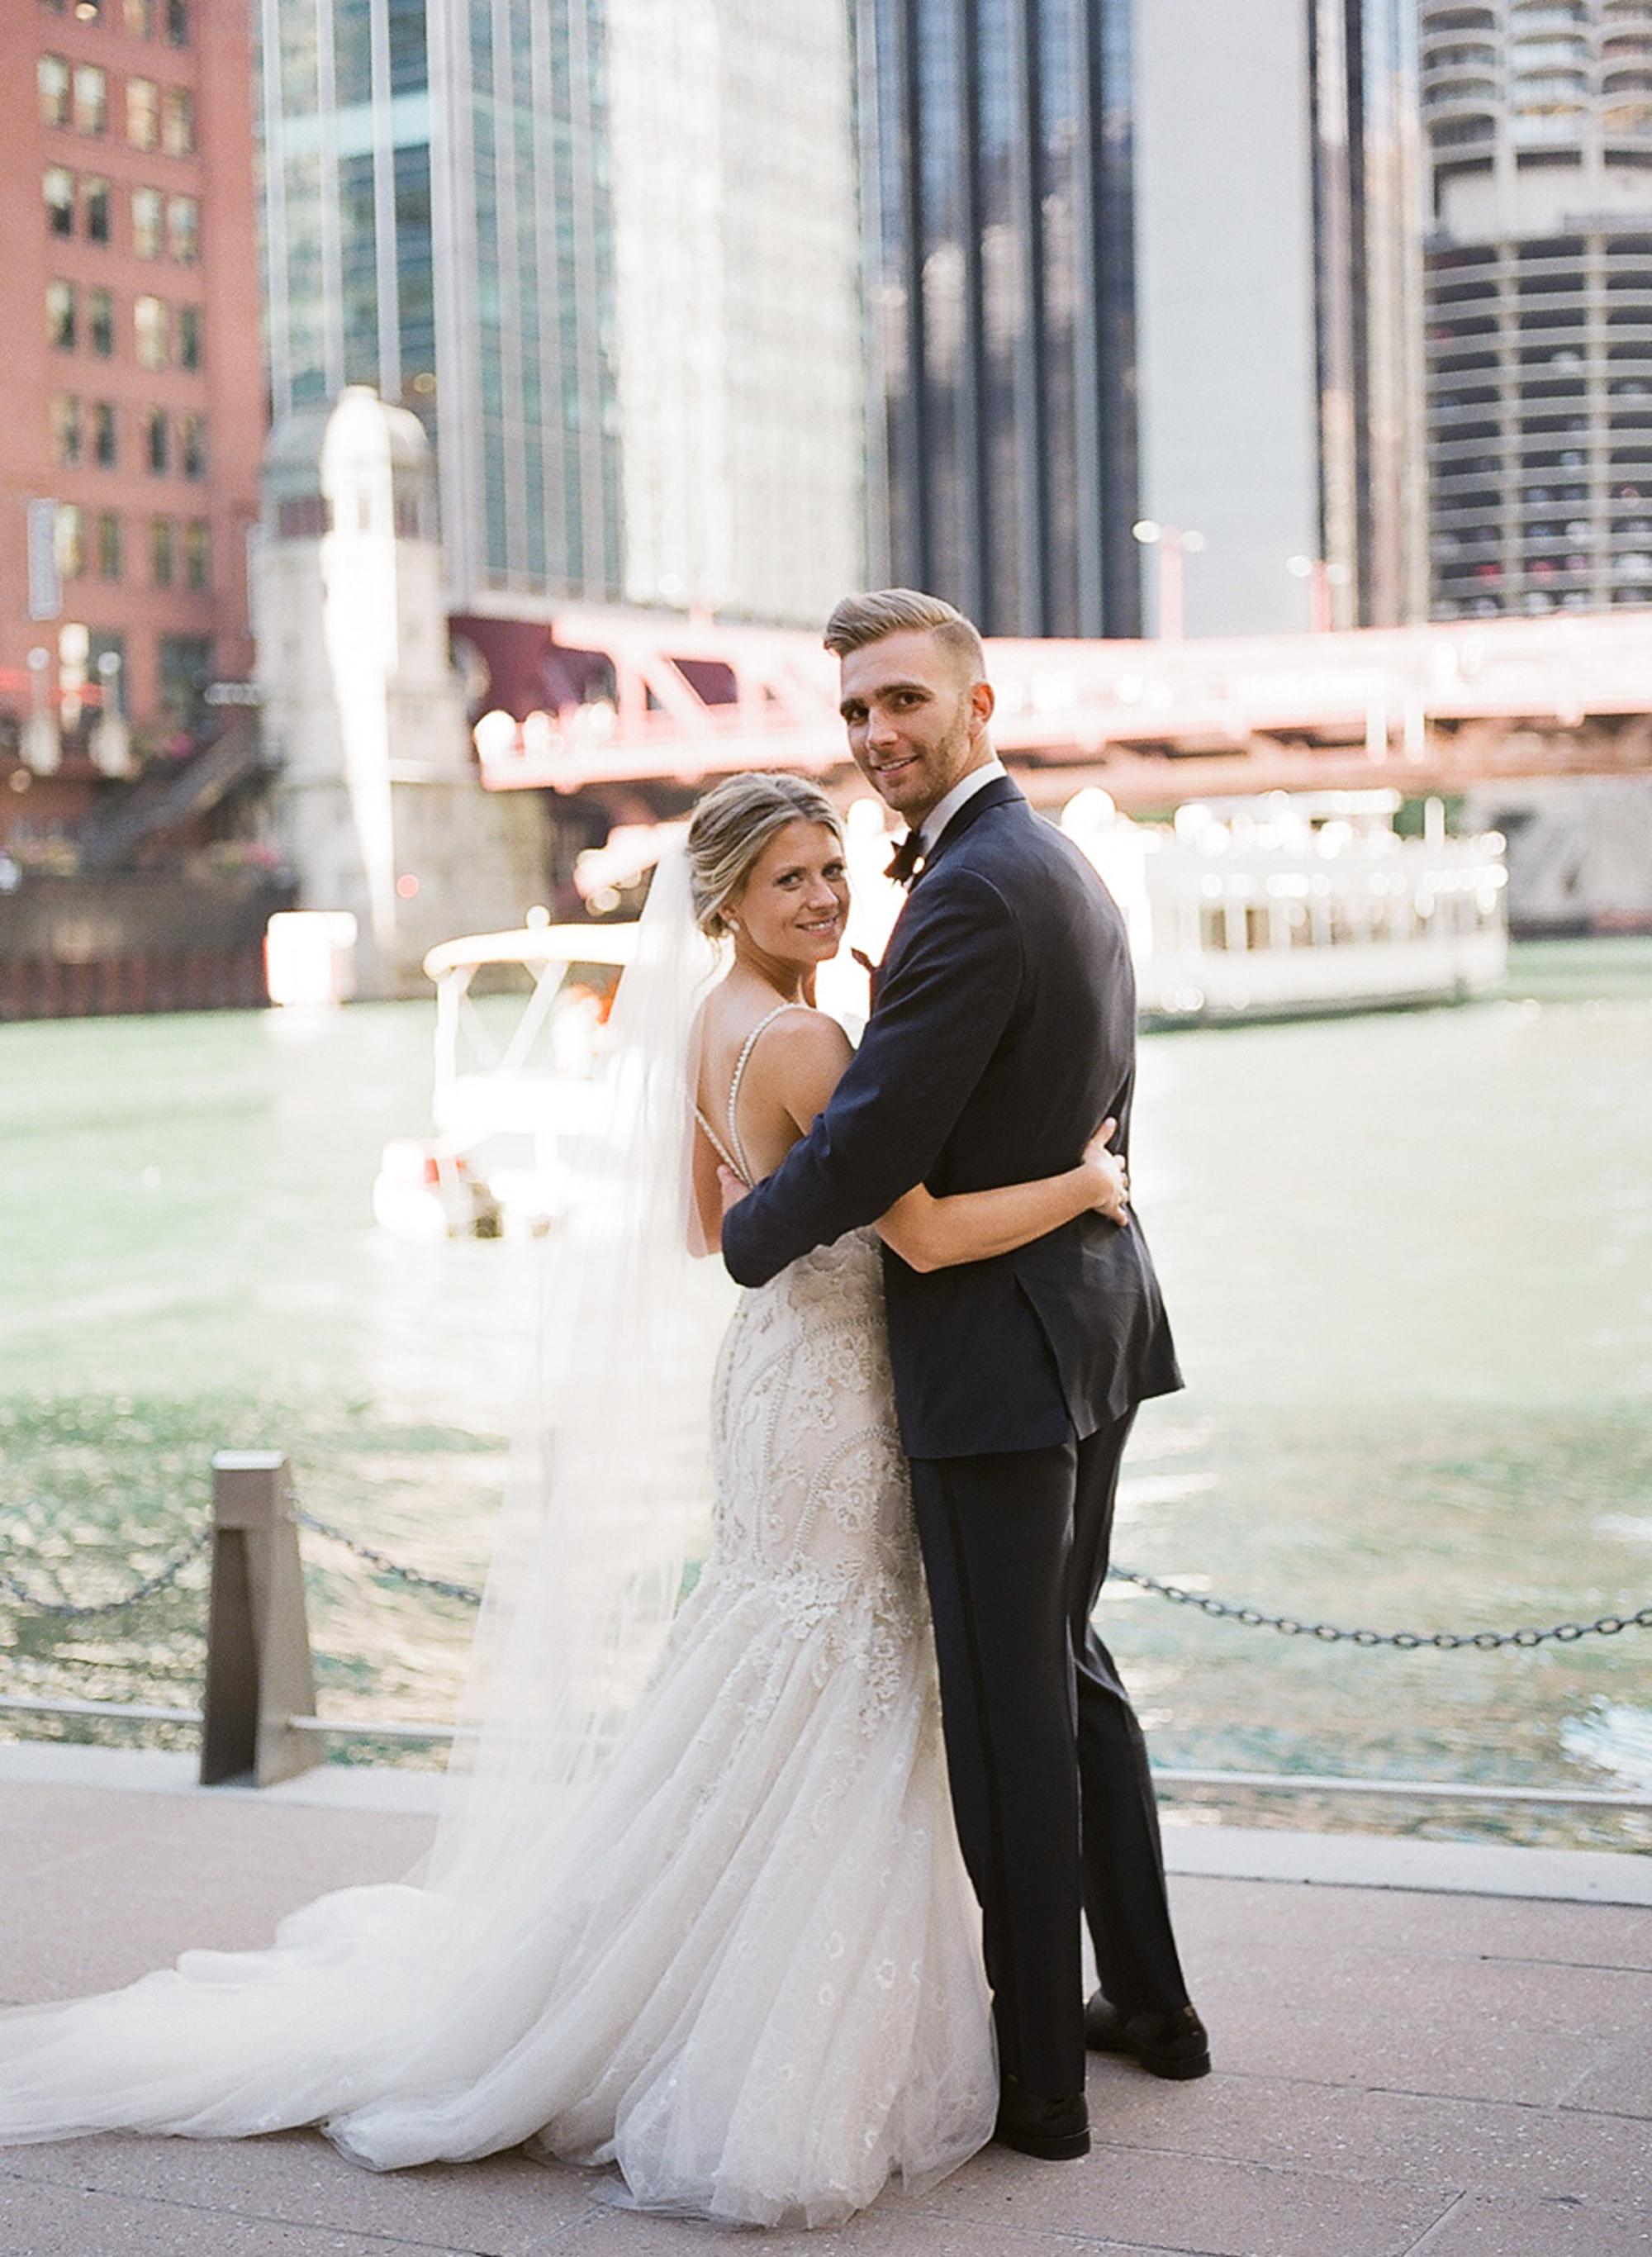 Bonphotage Chicago Wedding Photography - River Roast